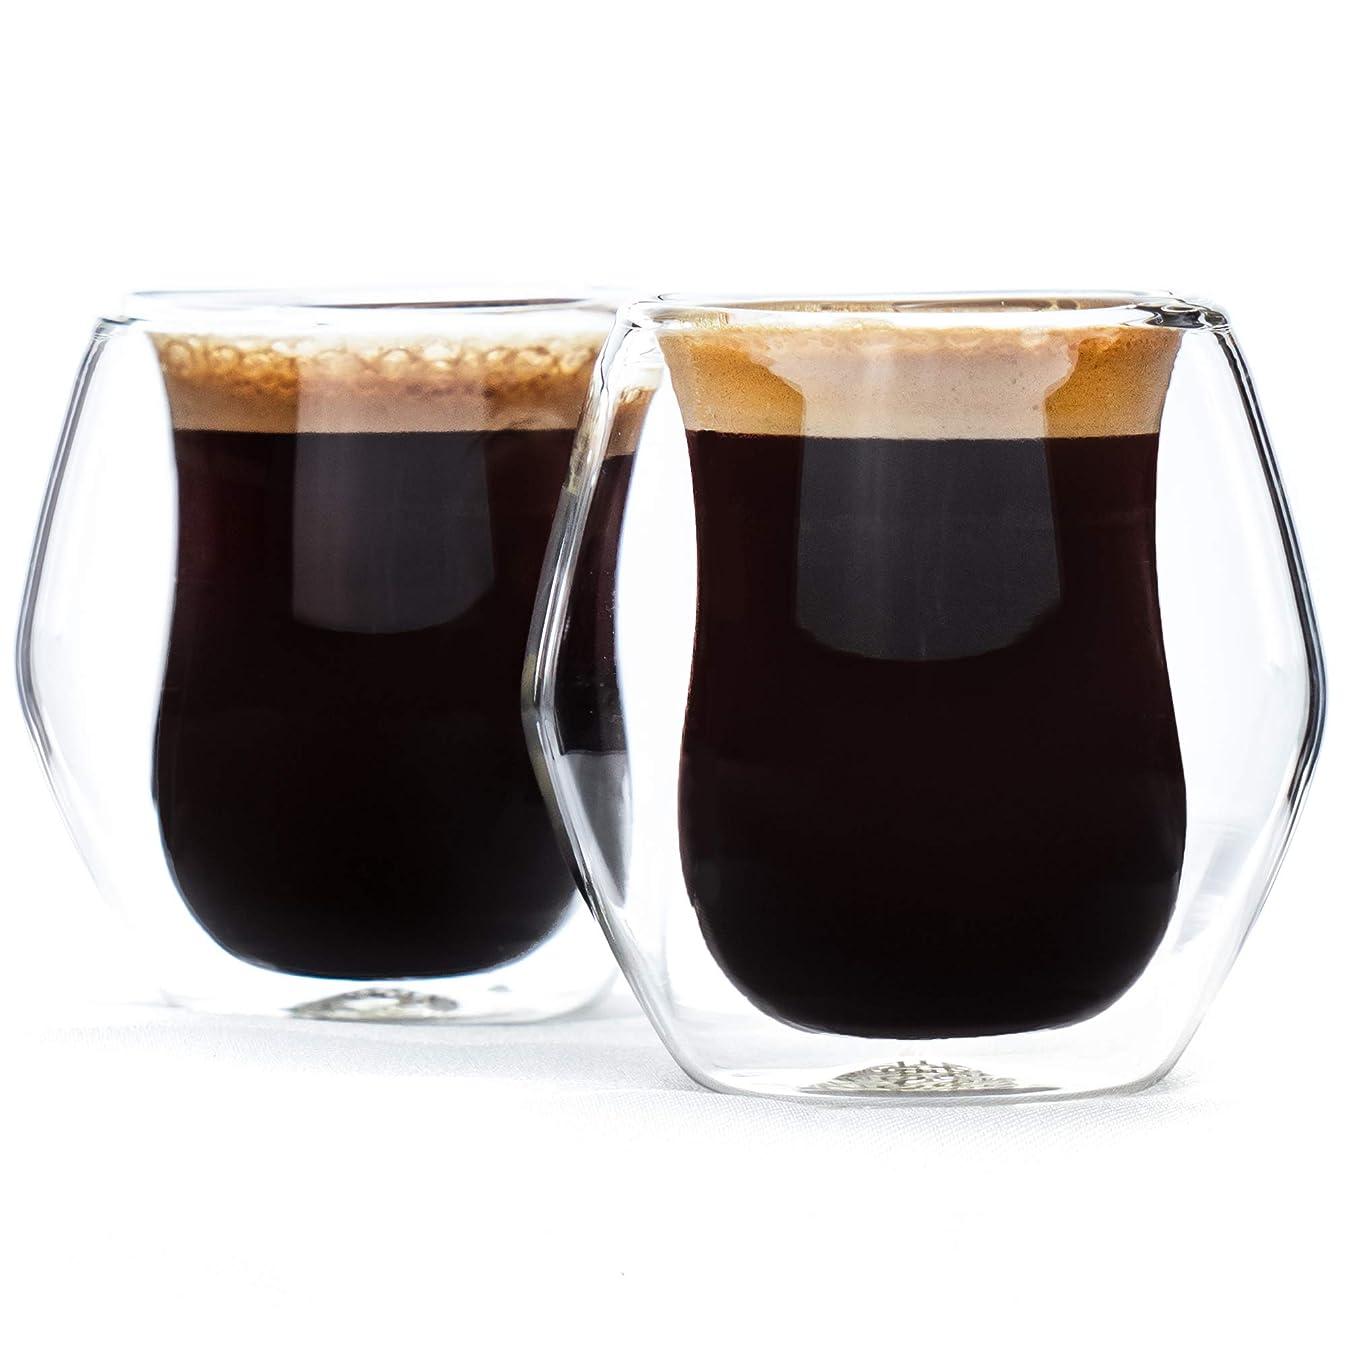 Encora Espresso Glass Cups, Double Shot Size (2.5 oz), Set of 2, Double Wall Insulated, Gift Boxed, Clear Mugs, Demitasse, Latte, Macchiato, Piccolo, Lungo, Italian, Small Coffee or Tea